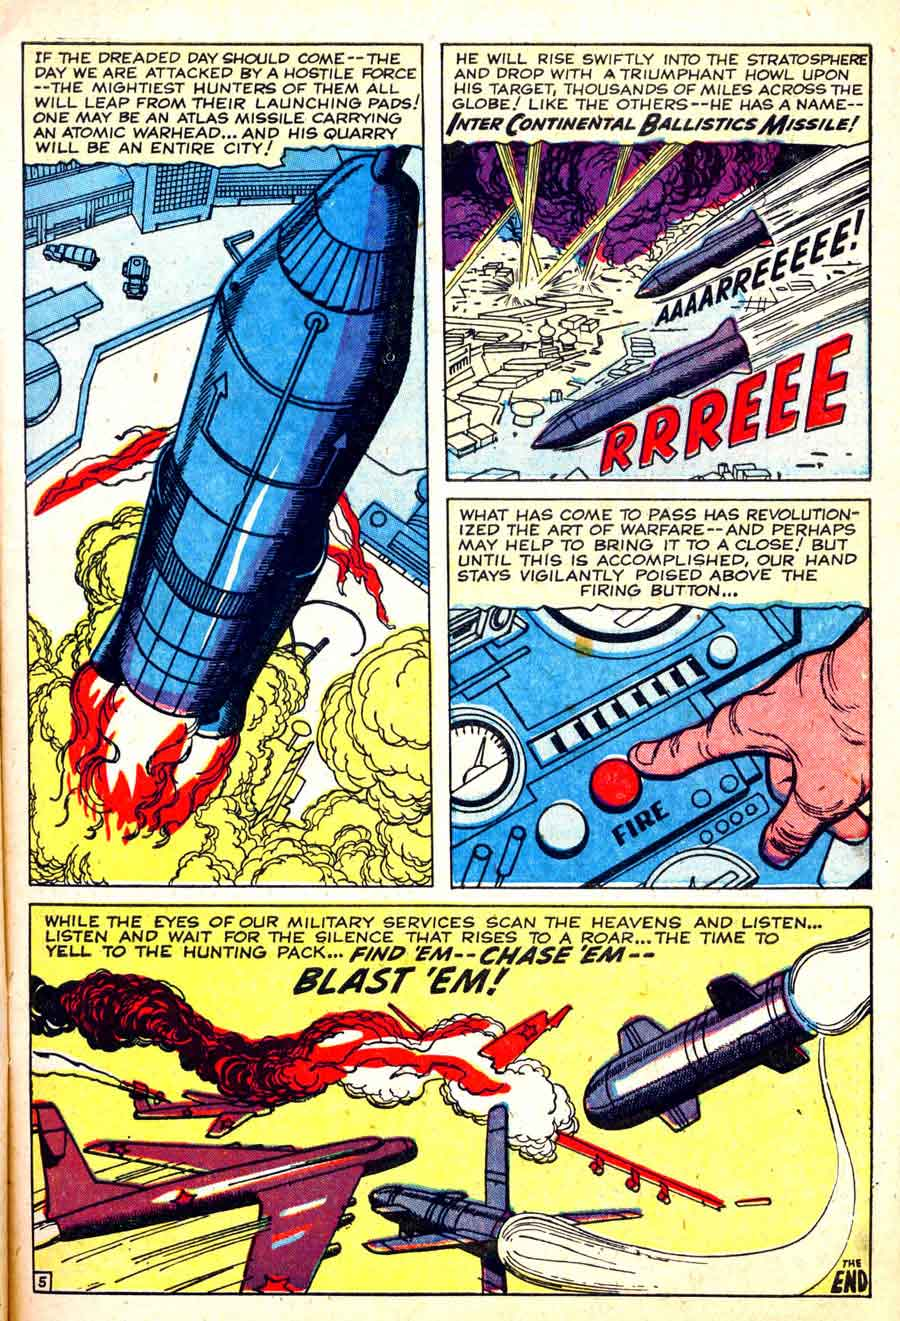 Jack Kirby silver age 1950s atlas war comic book page - Battle #65